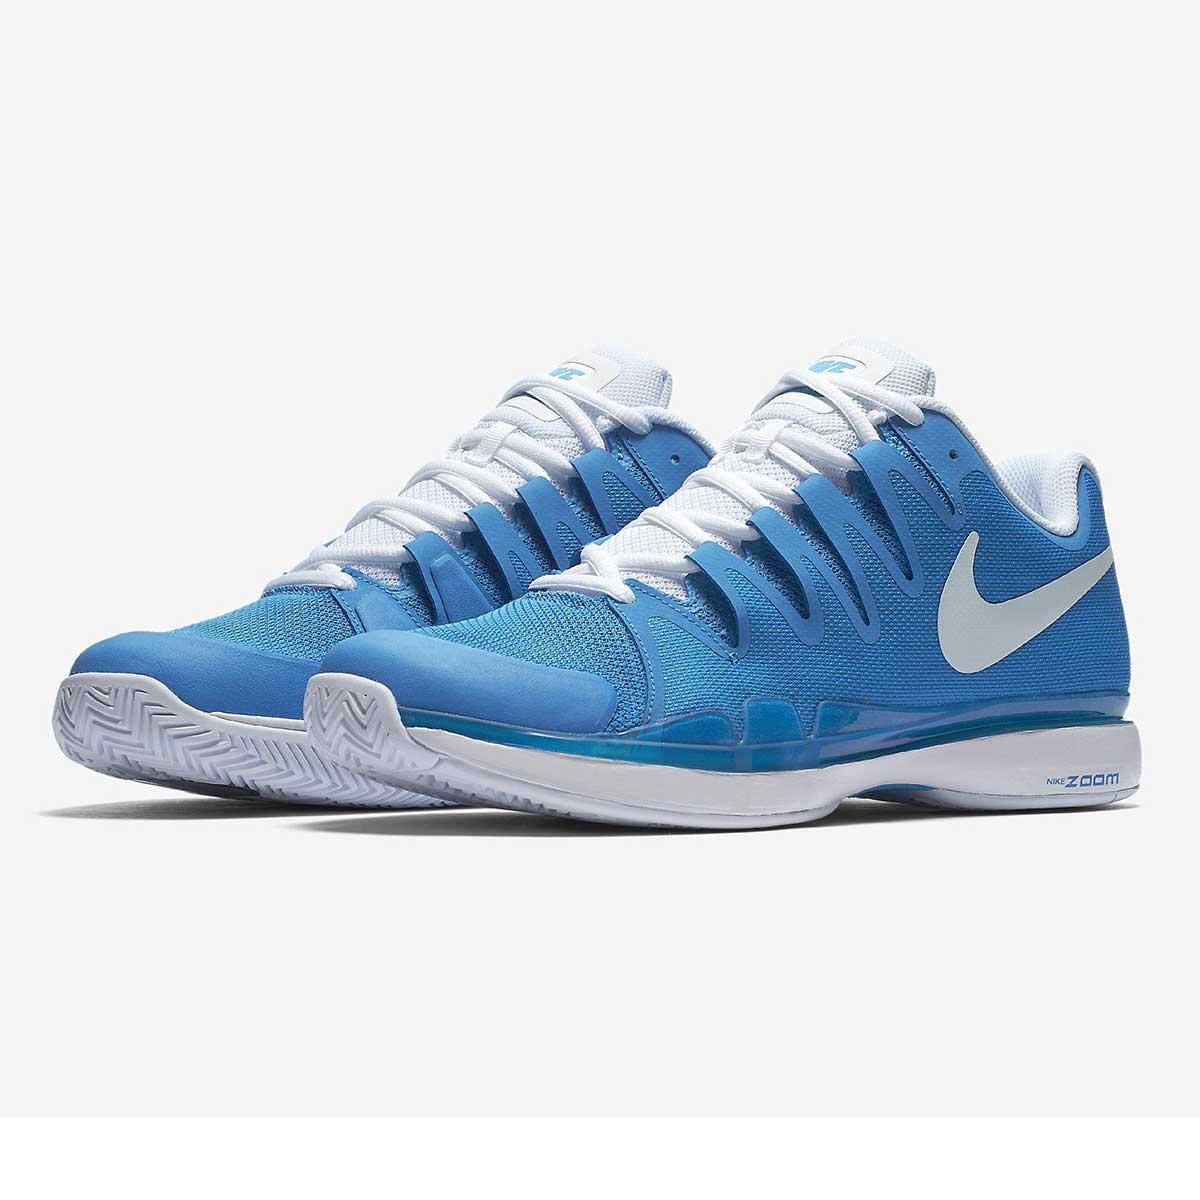 Tennis Shoes, Tennis, Sports, Buy, Nike, Nike Zoom Vapor 9.5 Tour Tennis  Shoes